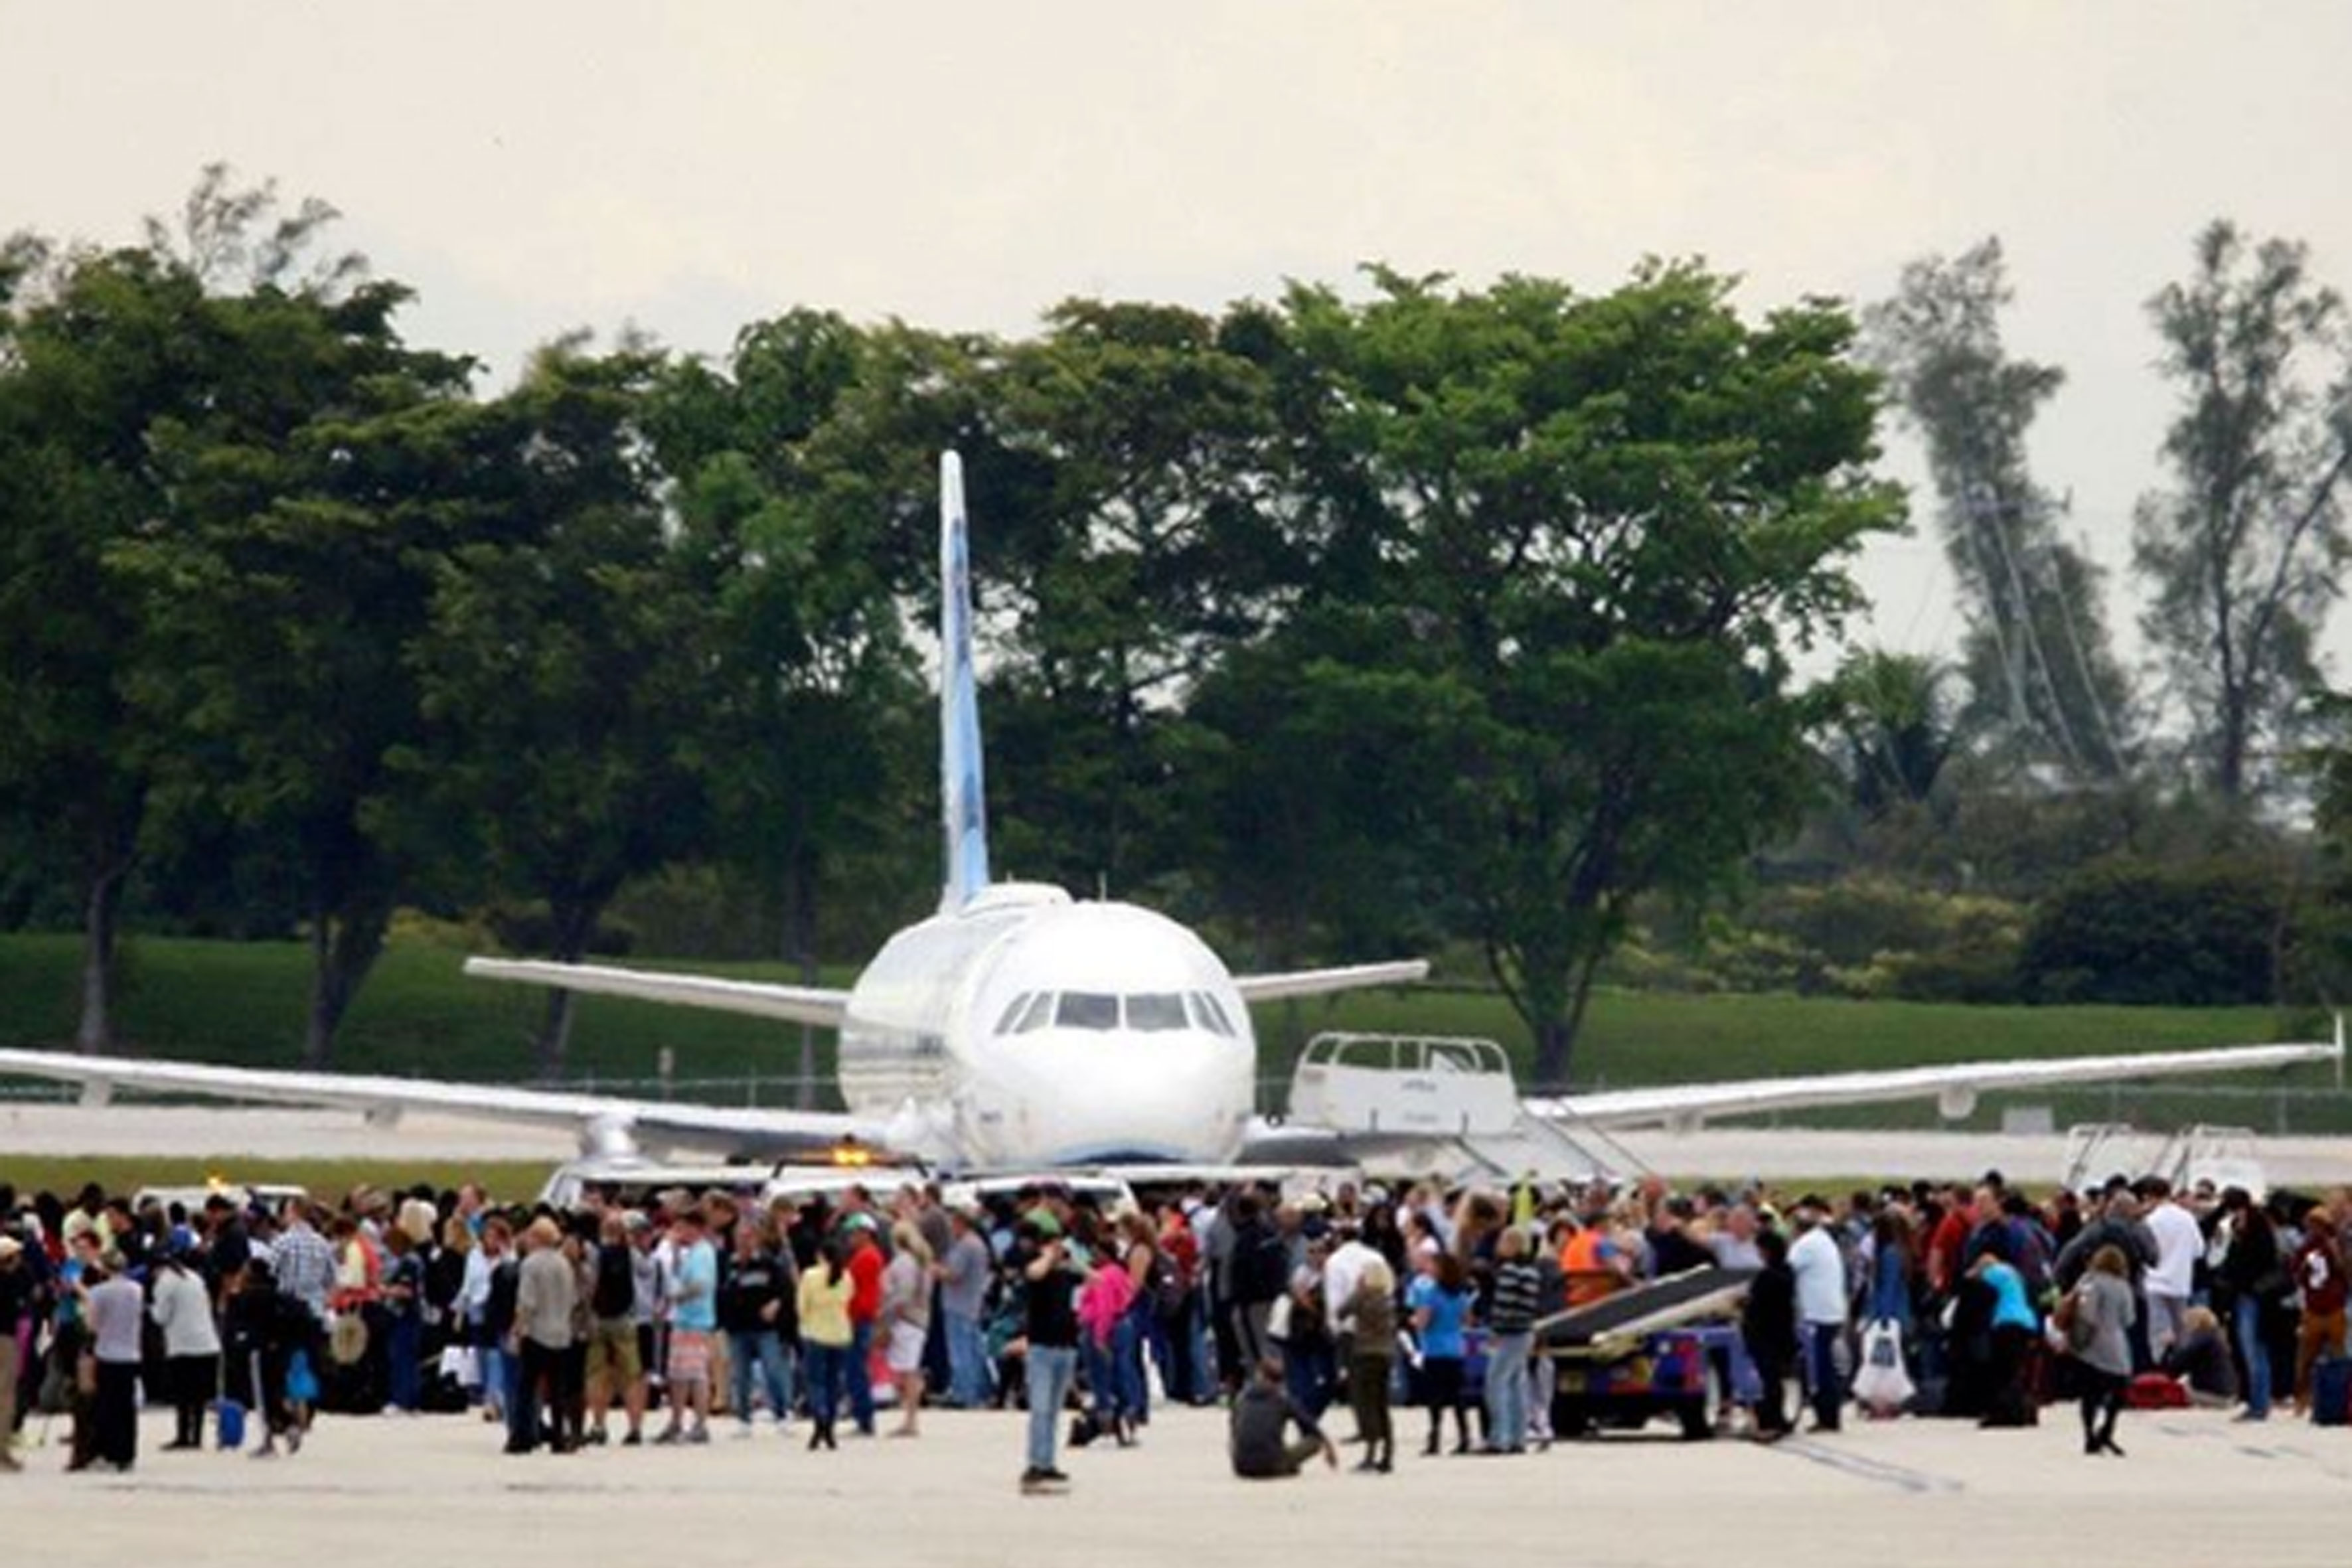 Tiroteio no aeroporto da Flórida deixa 5 mortos e 8 feridos